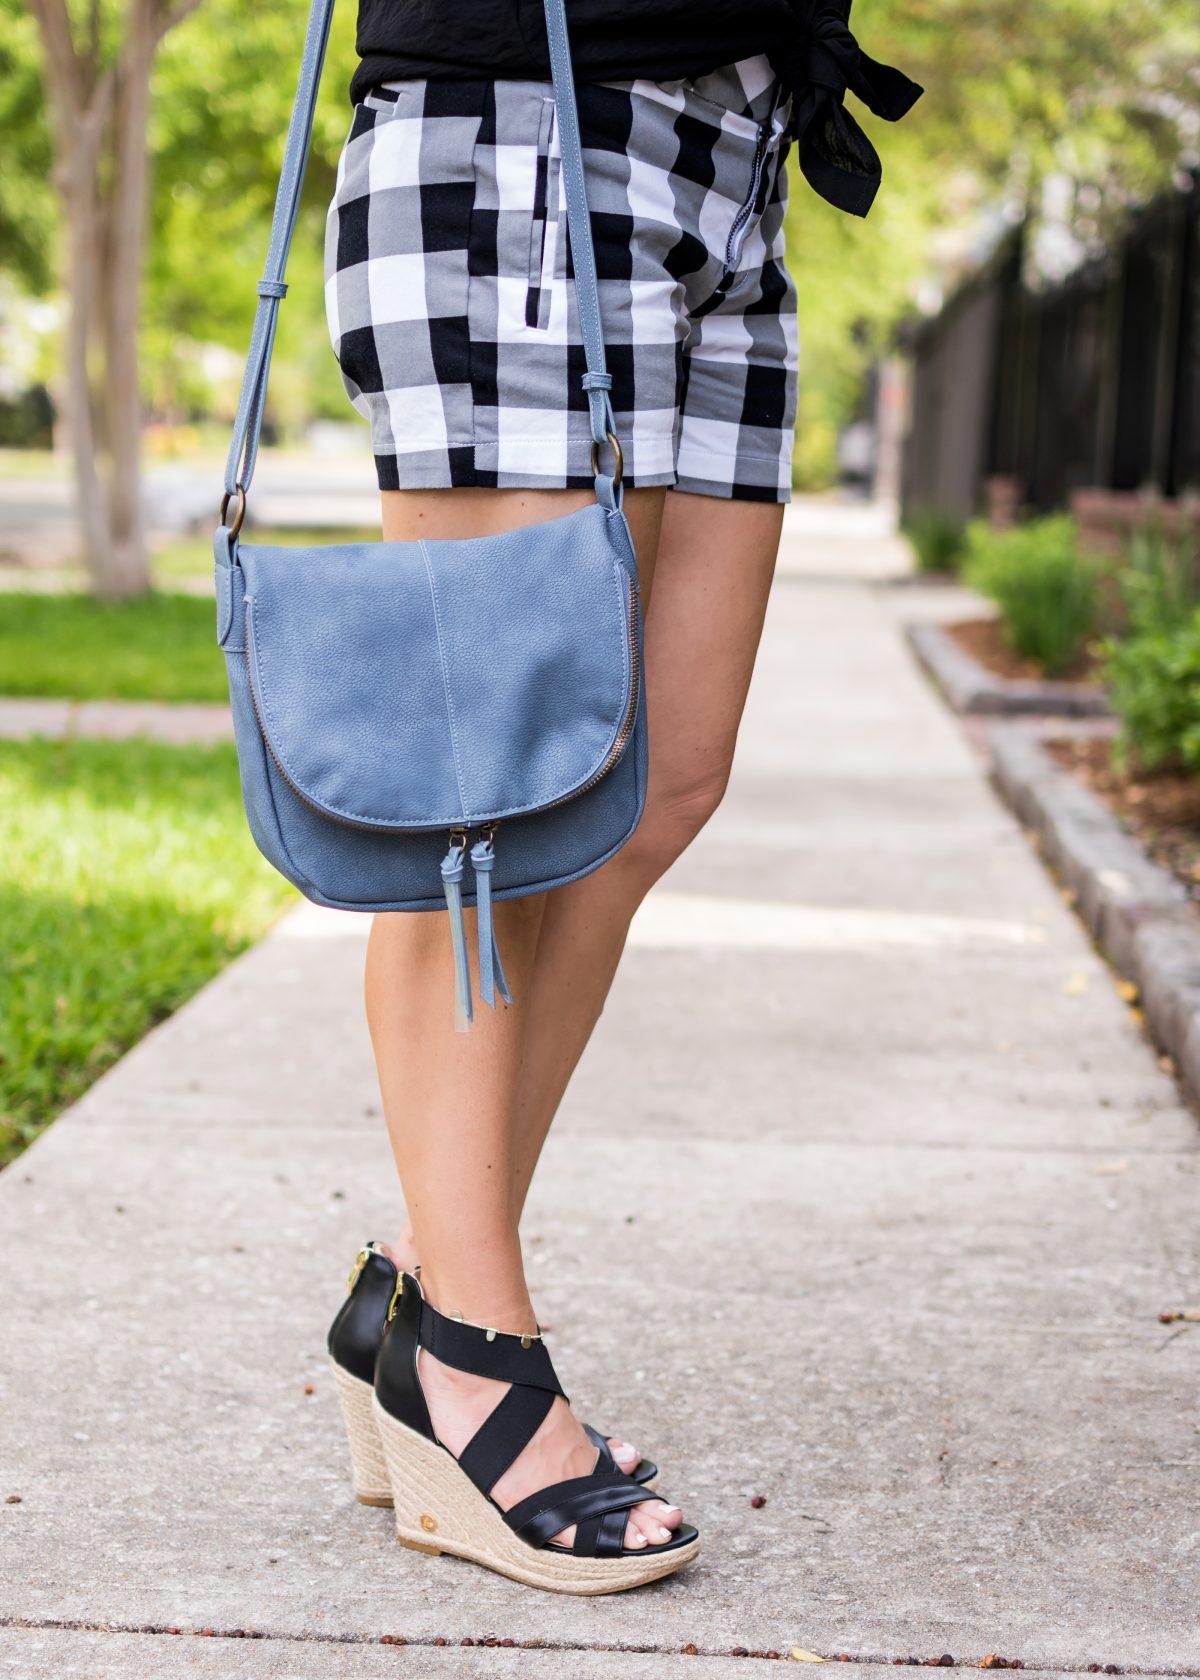 Spring fashion -black and white gingham shorts 6